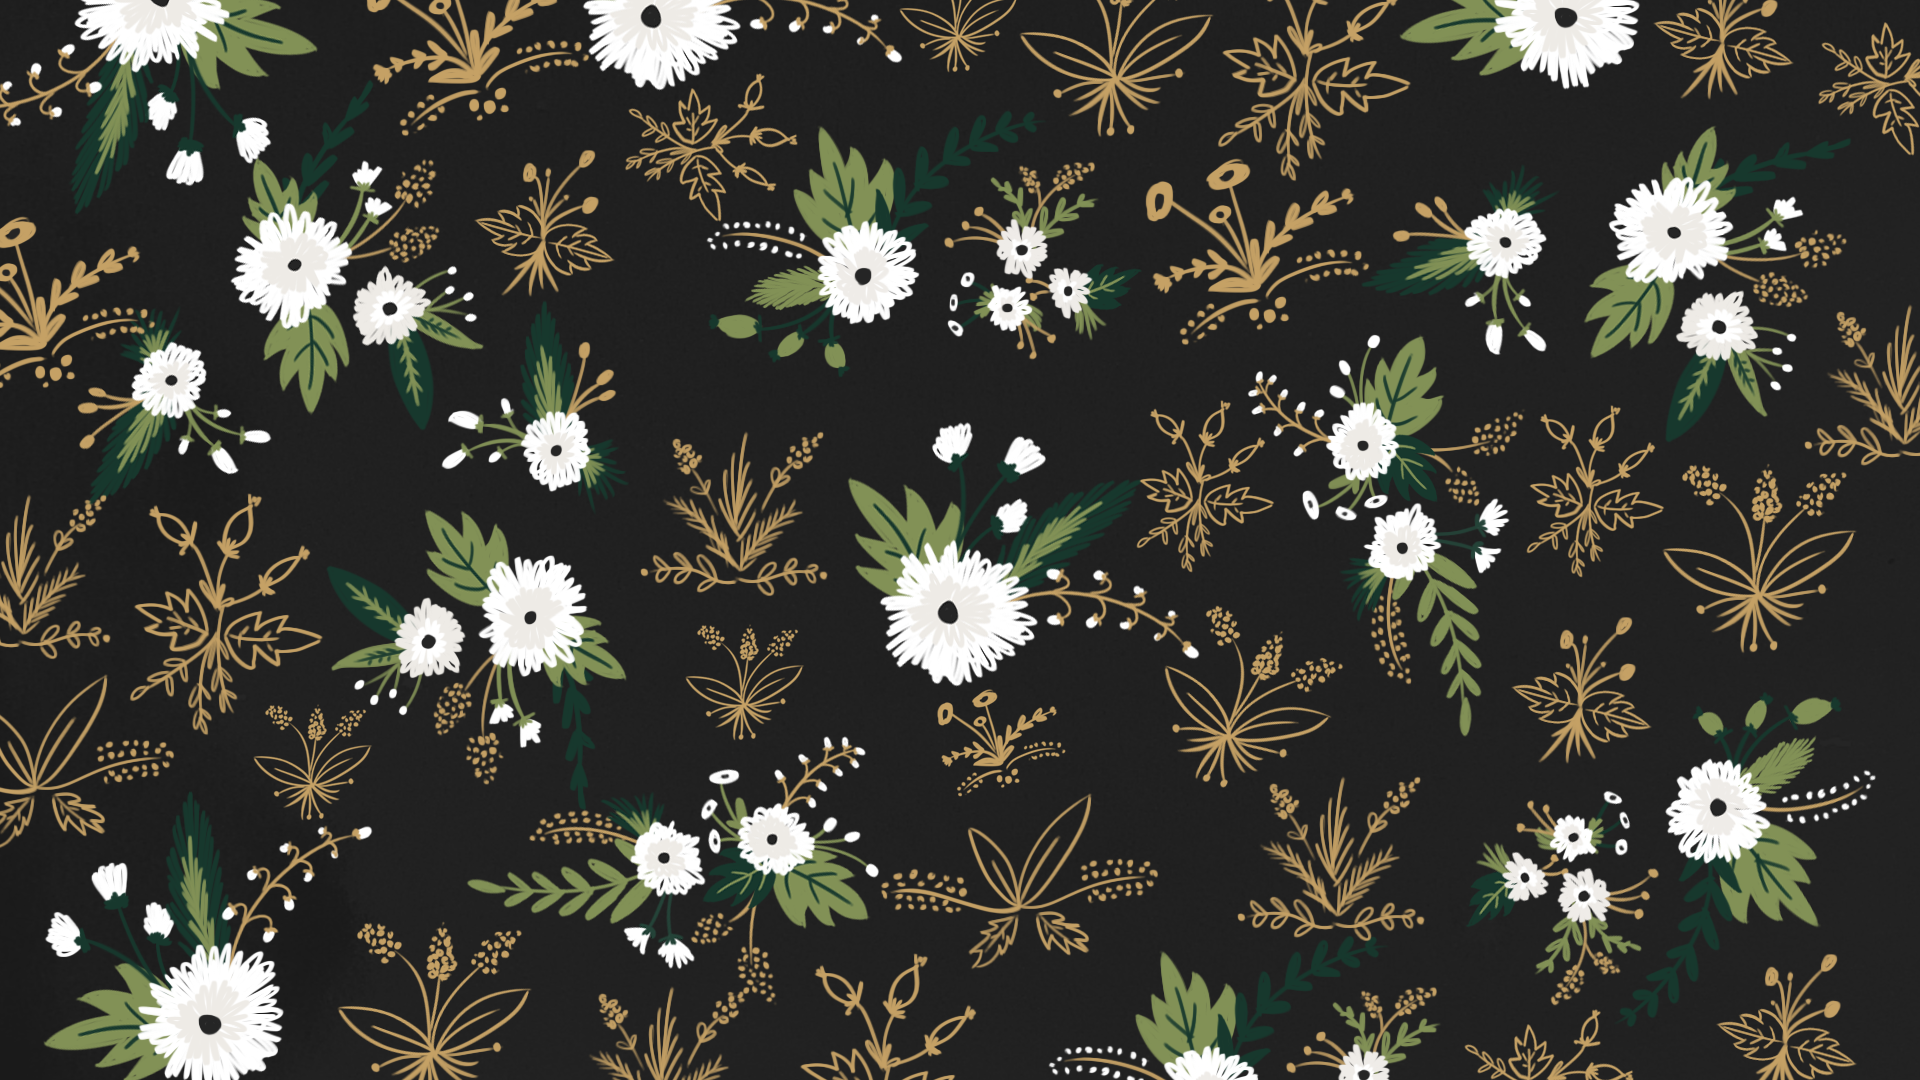 desktop positive pattern by cocorie d85k113 1920a—1080 pattern pinterest wallpaper floral wallpaper iphone and flower art